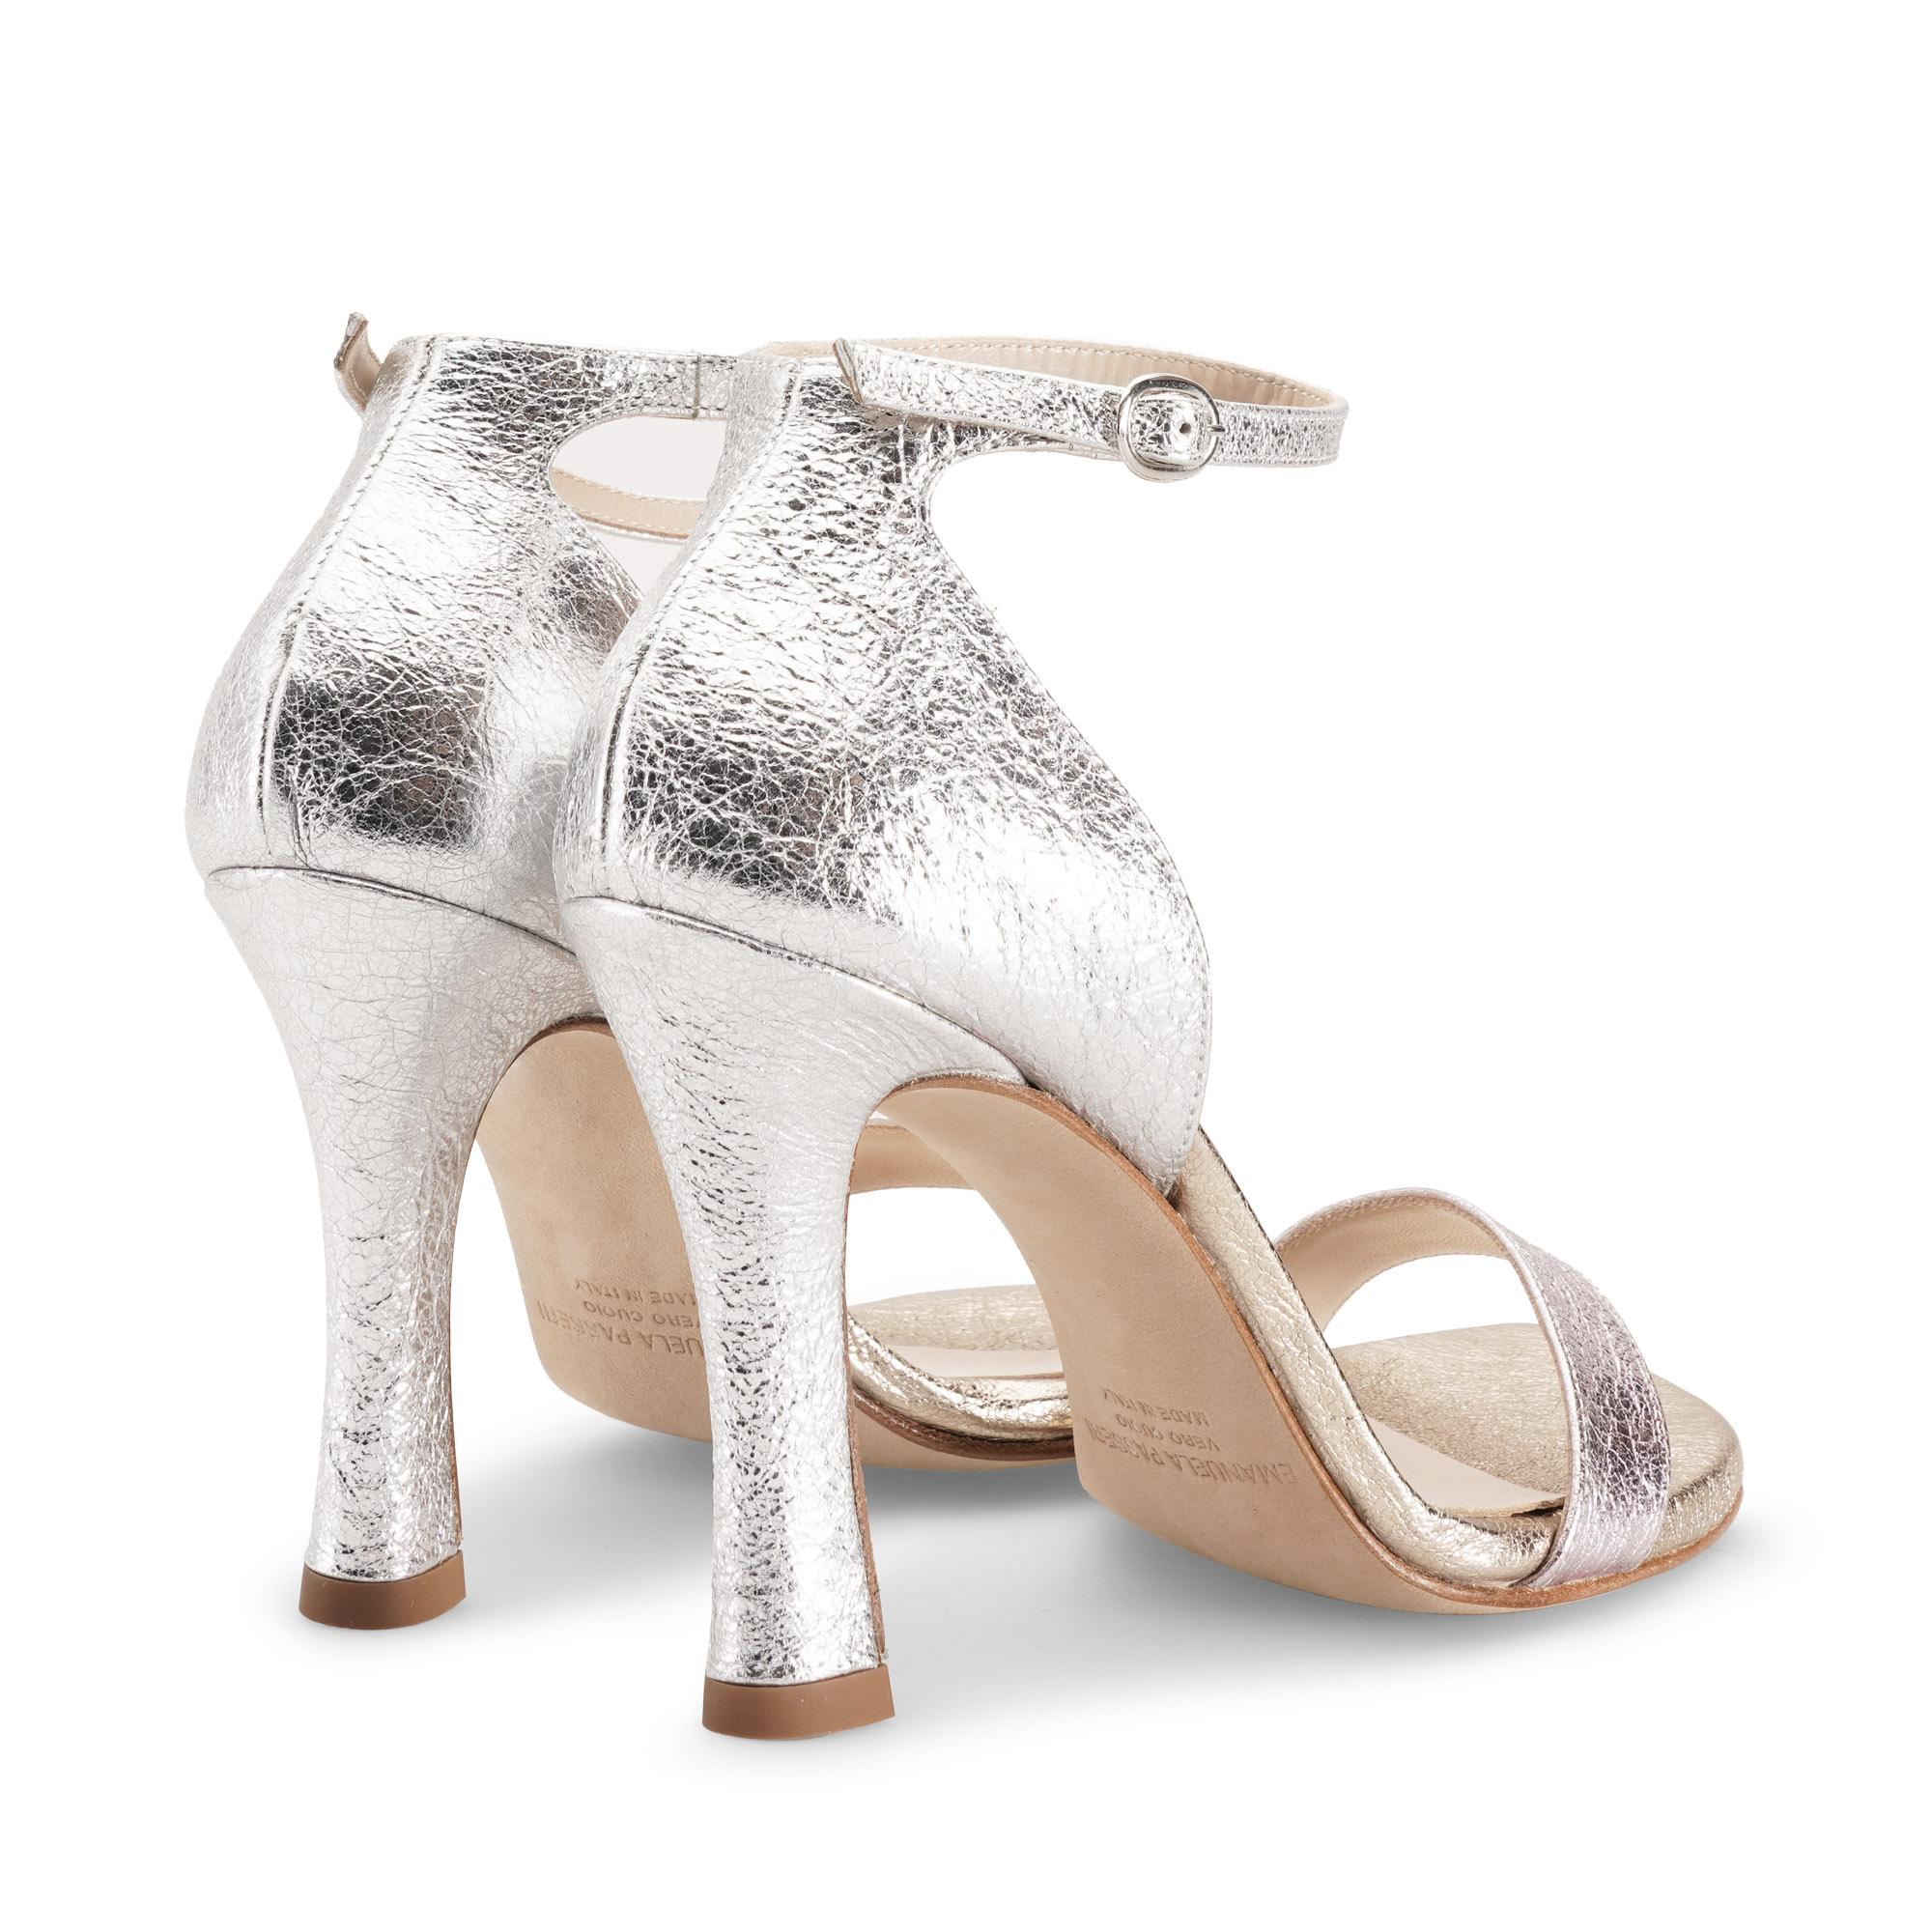 sandalo-donna-lamianto-argento-paltino-rosa-tacco-alto-emanuela-passeri-heels-shoes-spring-summer-2021